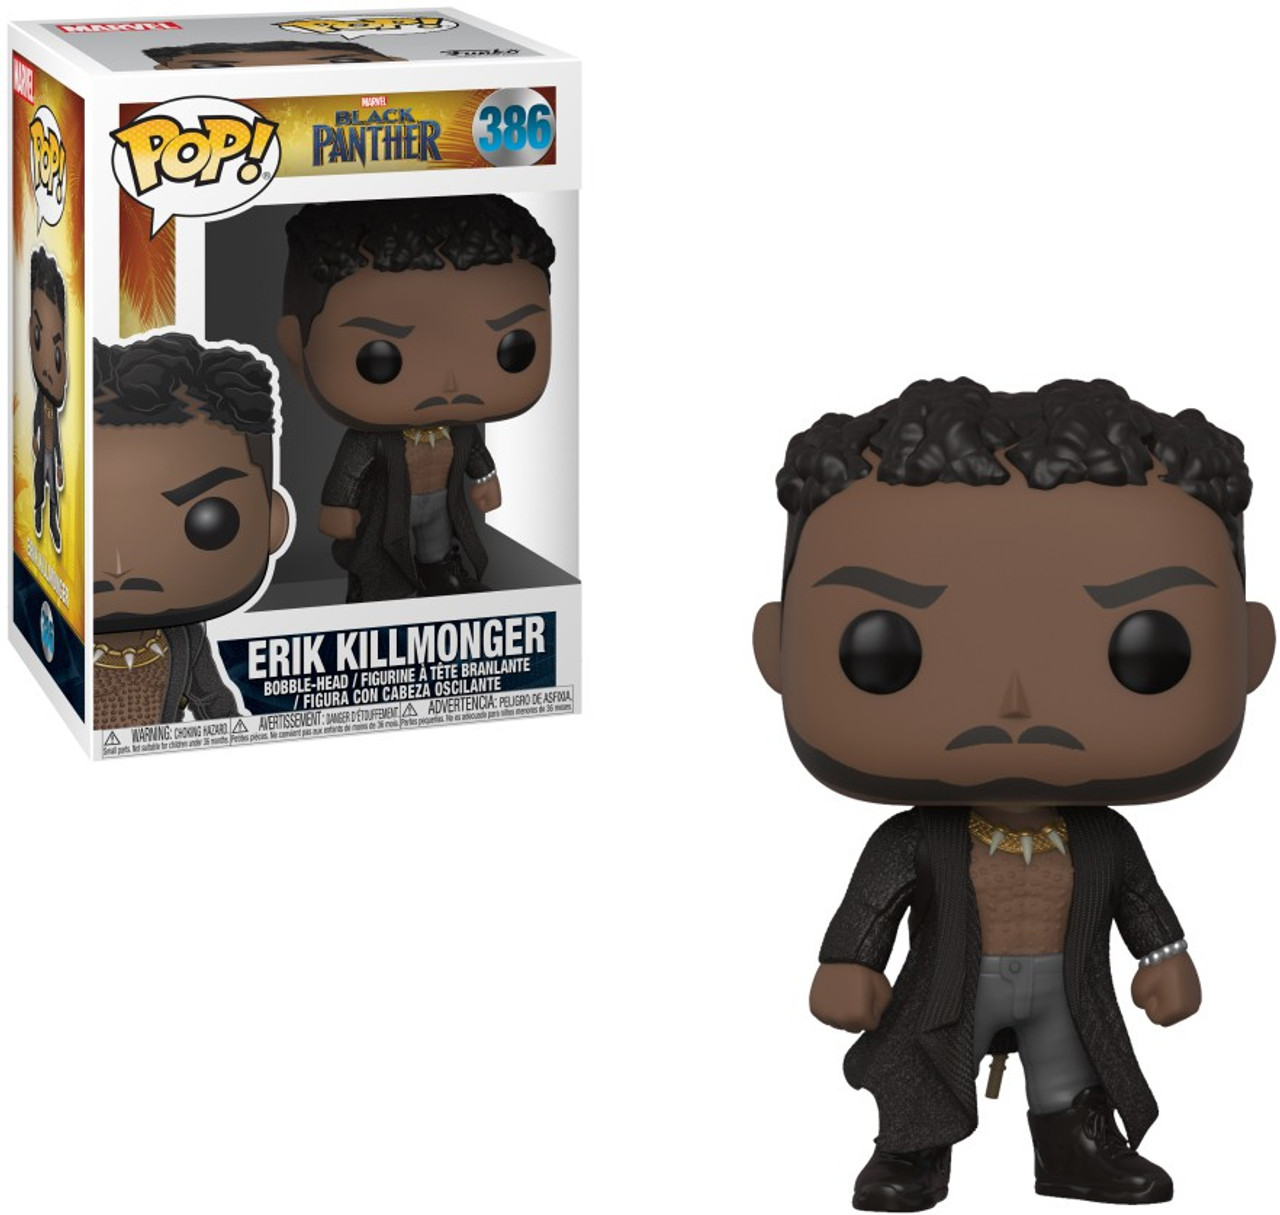 9a945b27159 Funko Marvel Universe Black Panther Funko POP Marvel Erik Killmonger 3.75 Vinyl  Figure 386 with Scars